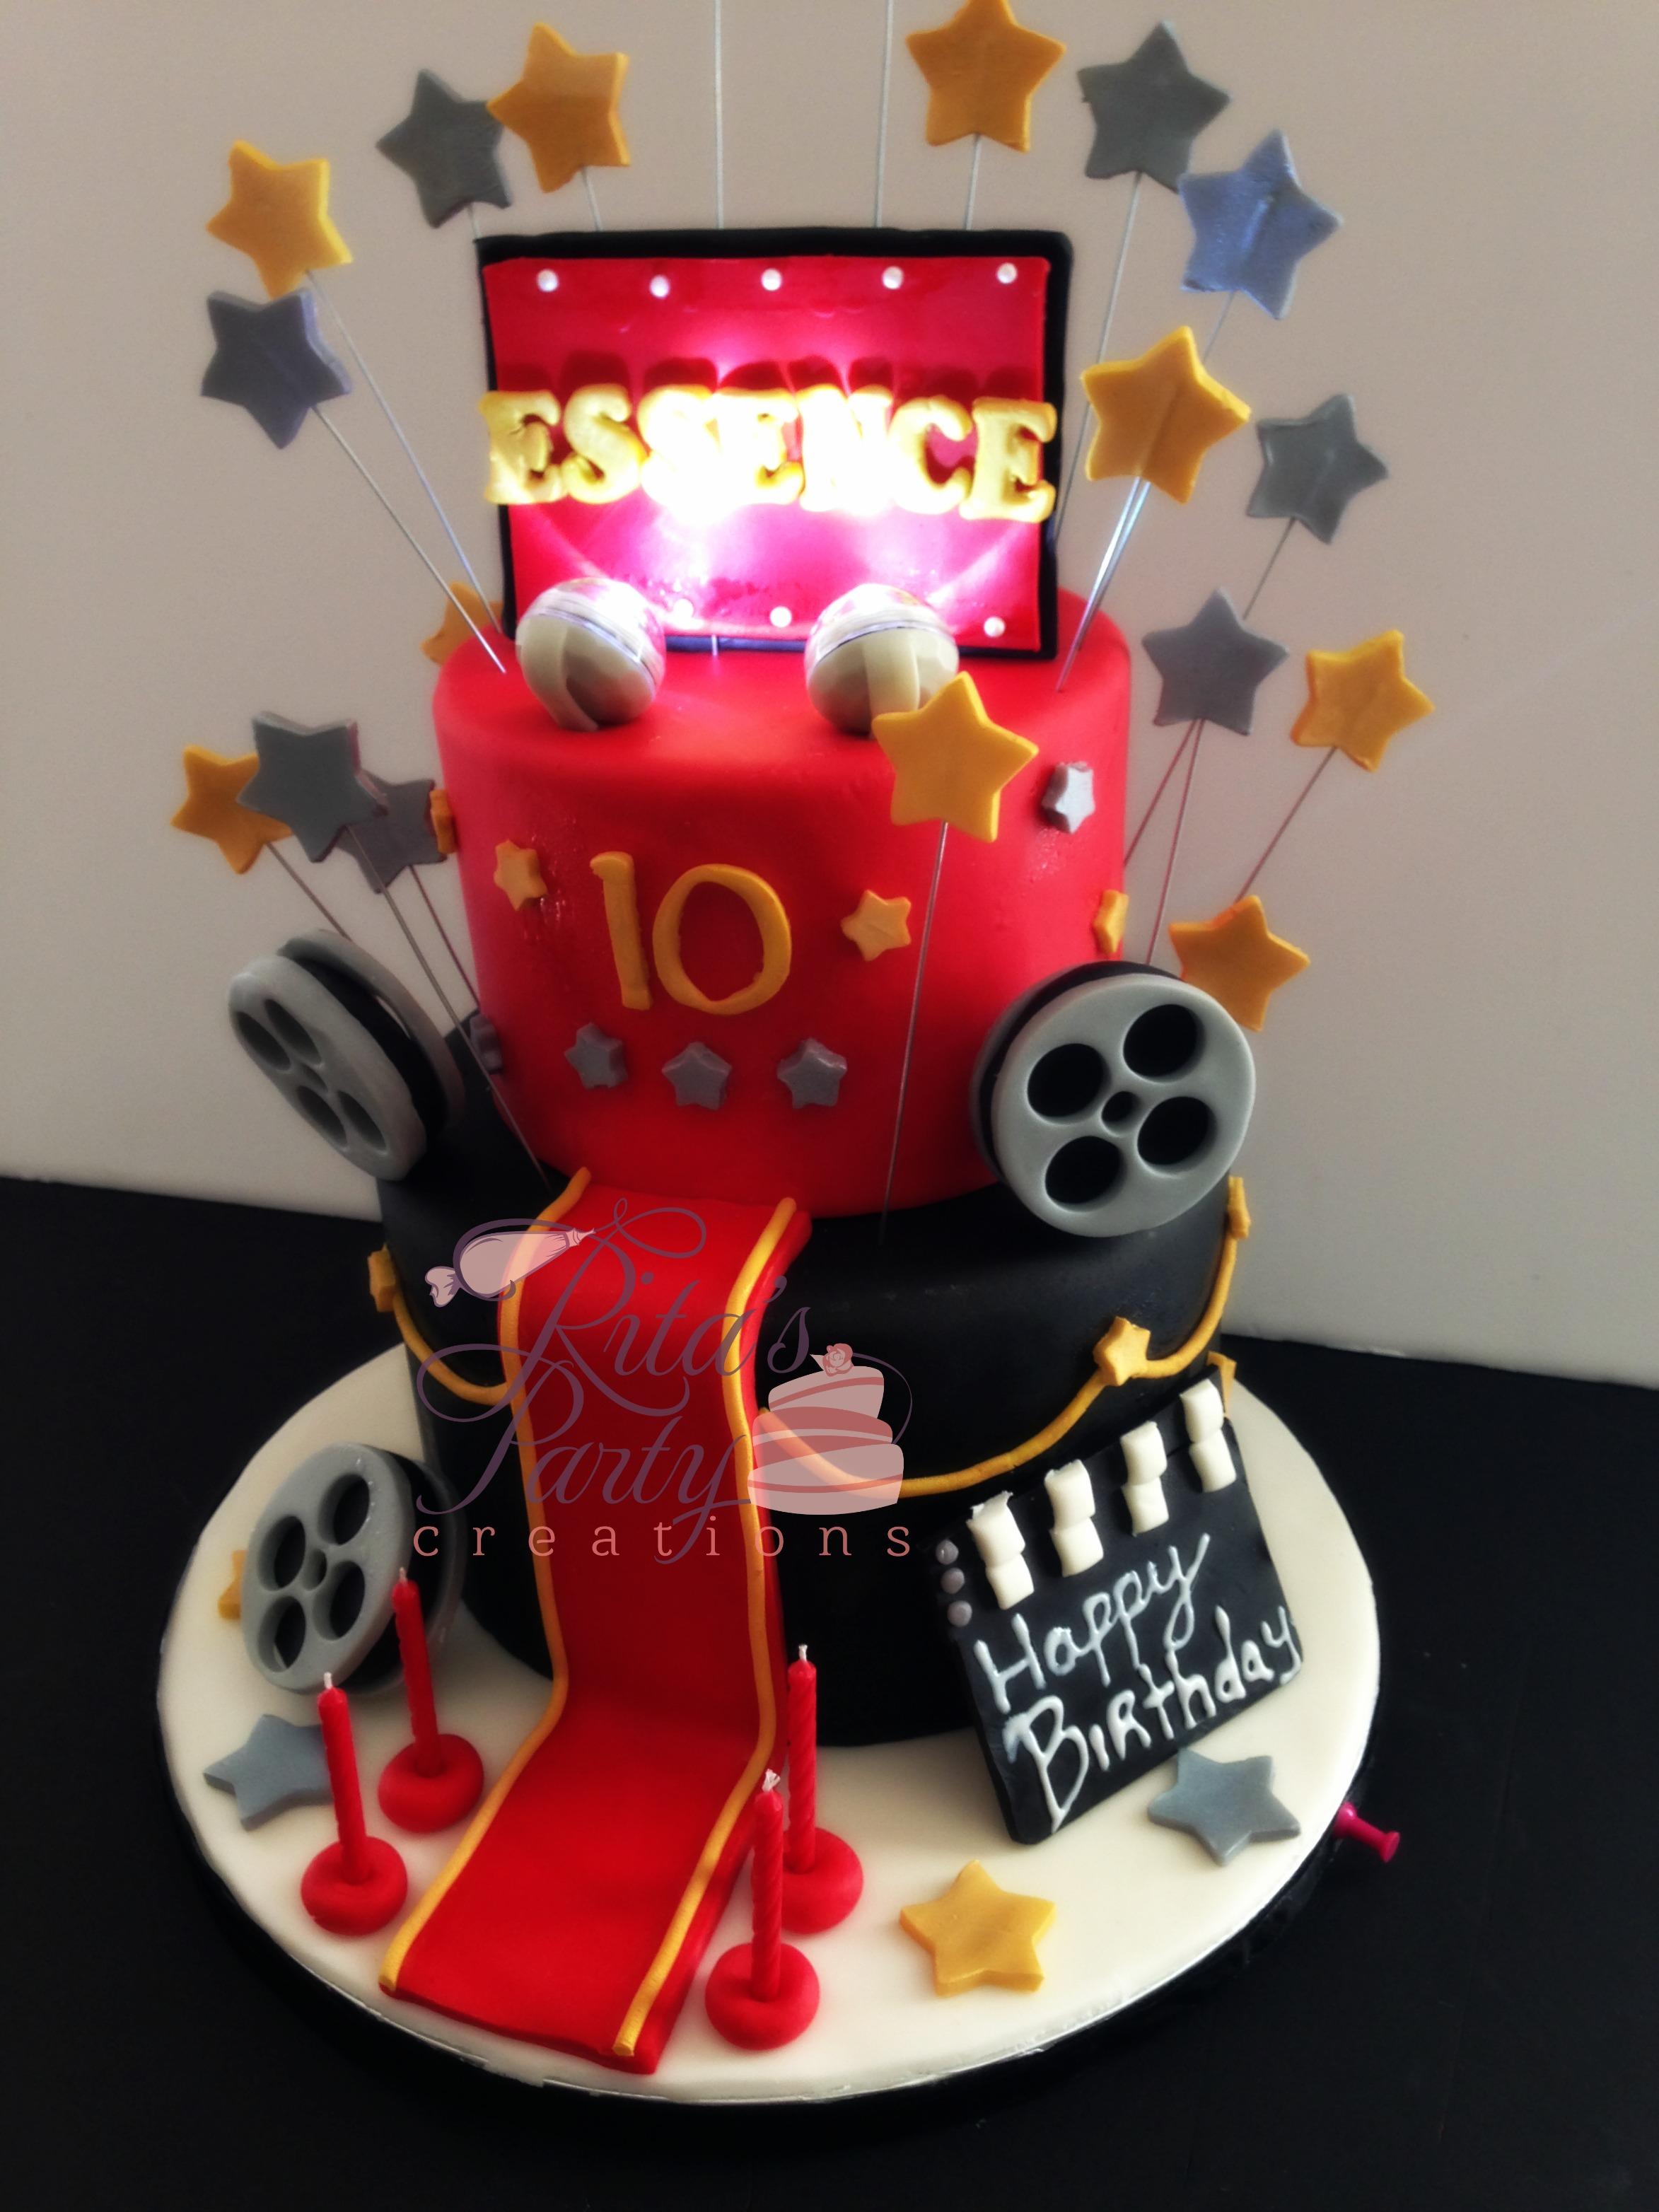 Astonishing Hollywood Theme Cakes Wedding Ideas Funny Birthday Cards Online Alyptdamsfinfo